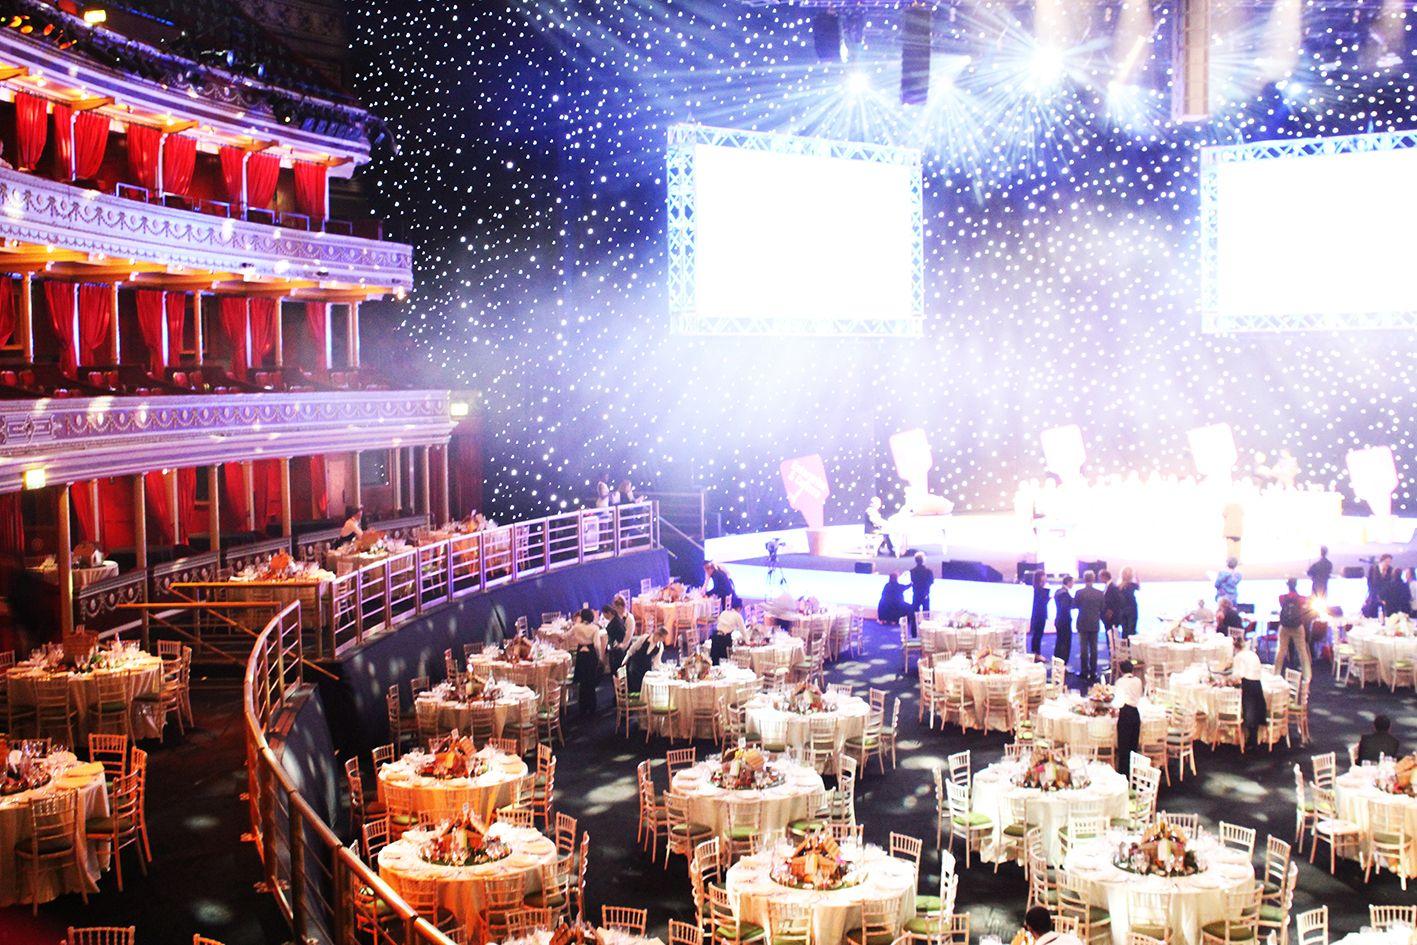 July Dinner Royal Albert Hall Venues Event